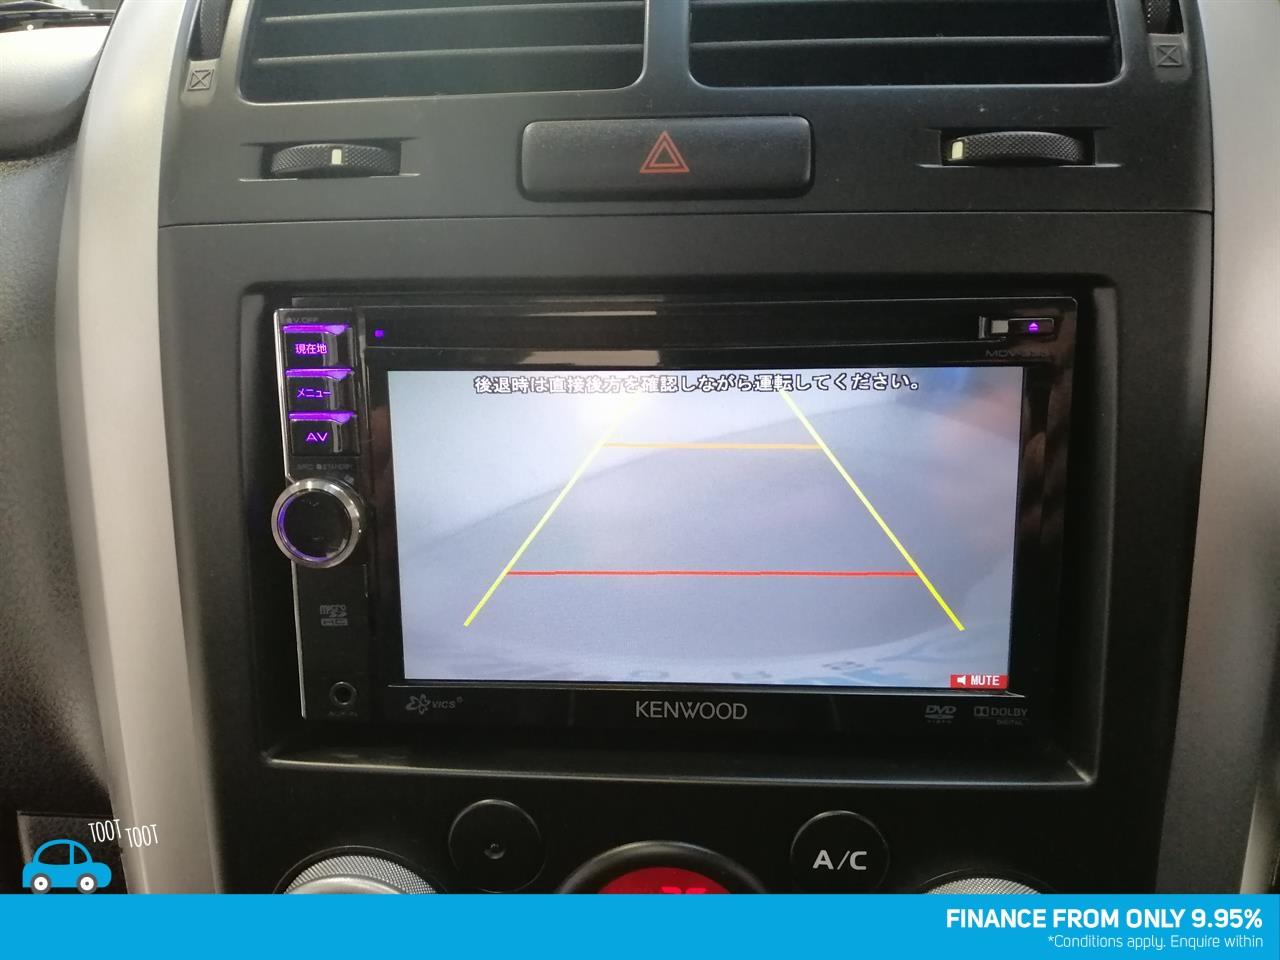 image-14, 2013 Suzuki ESCUDO CROSS ADVENTURE at Dunedin